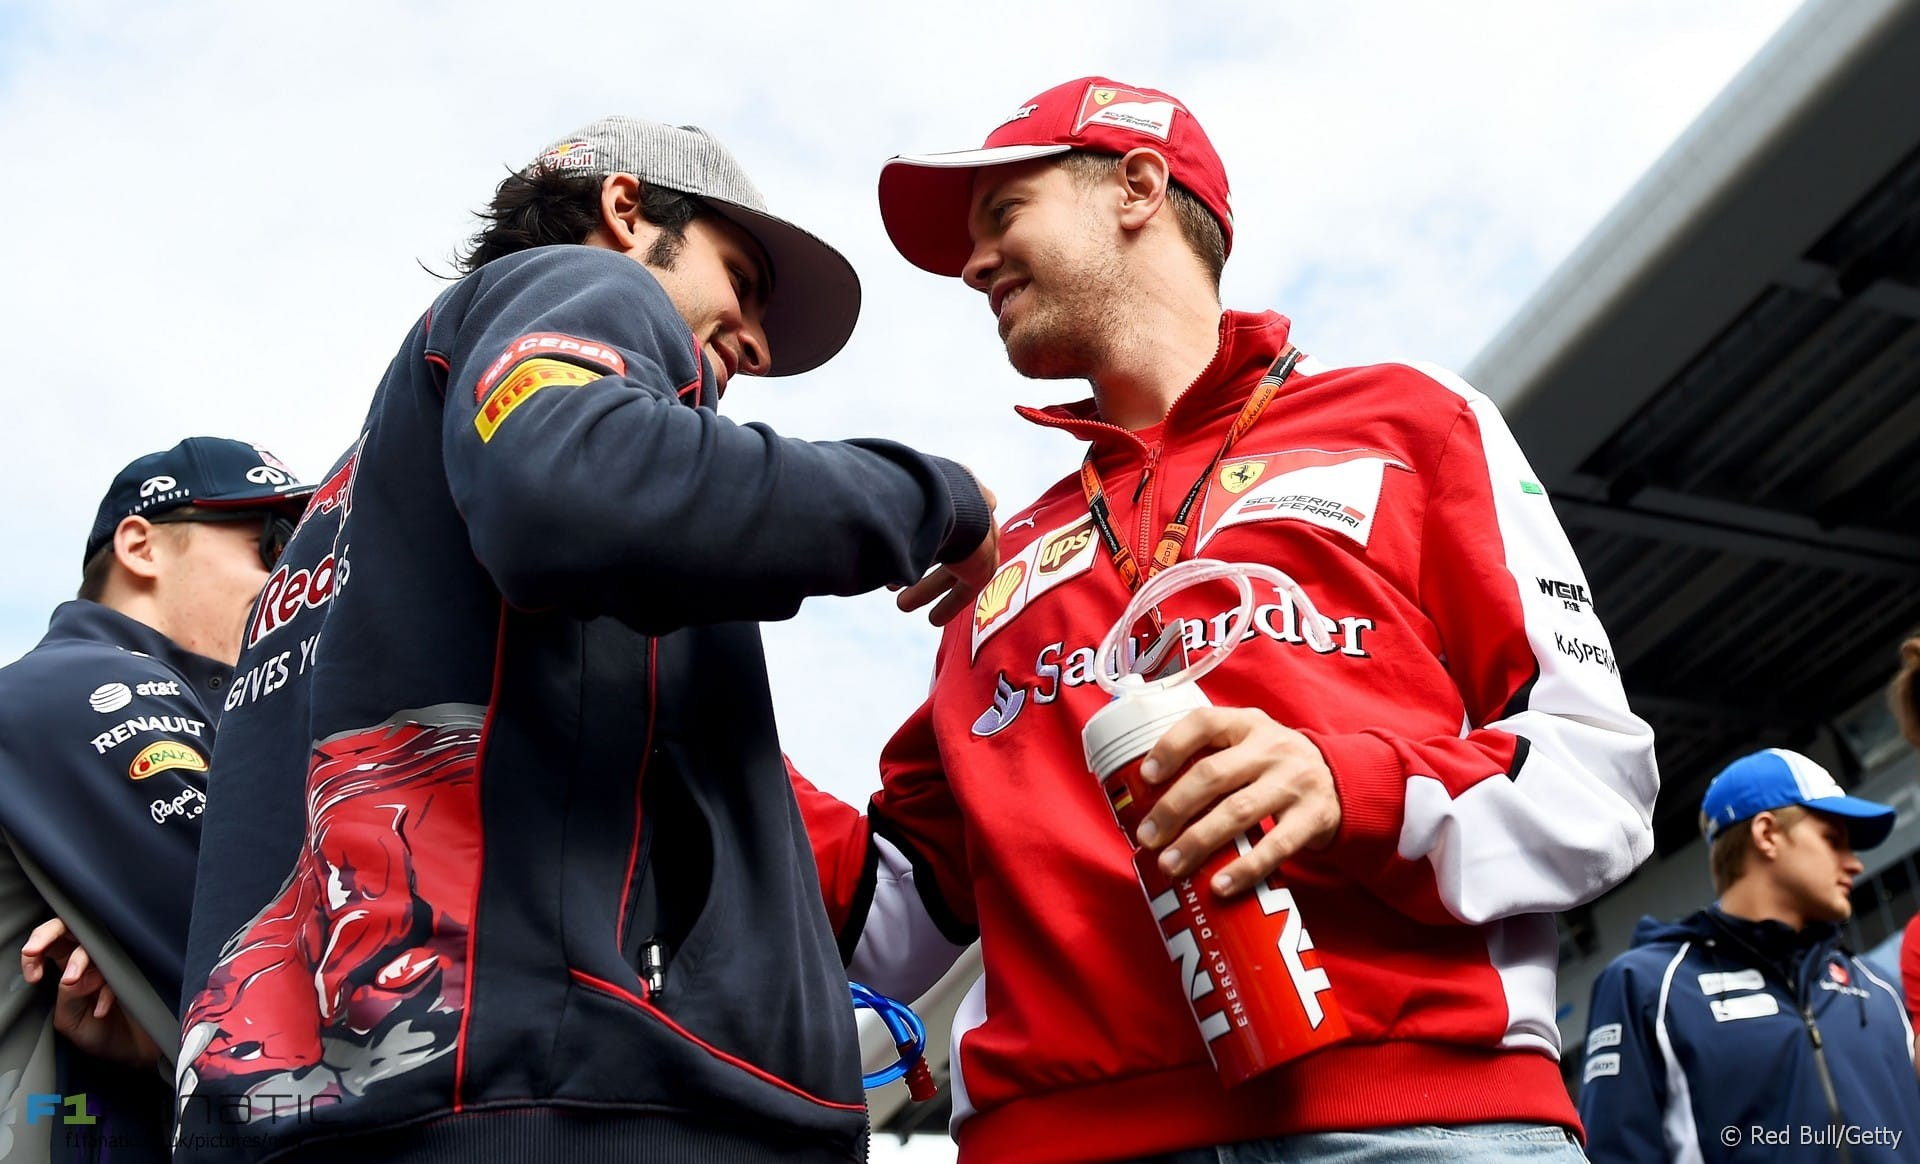 2nd place for Ferrari's Sebastian Vettel at the Russian Grand Prix